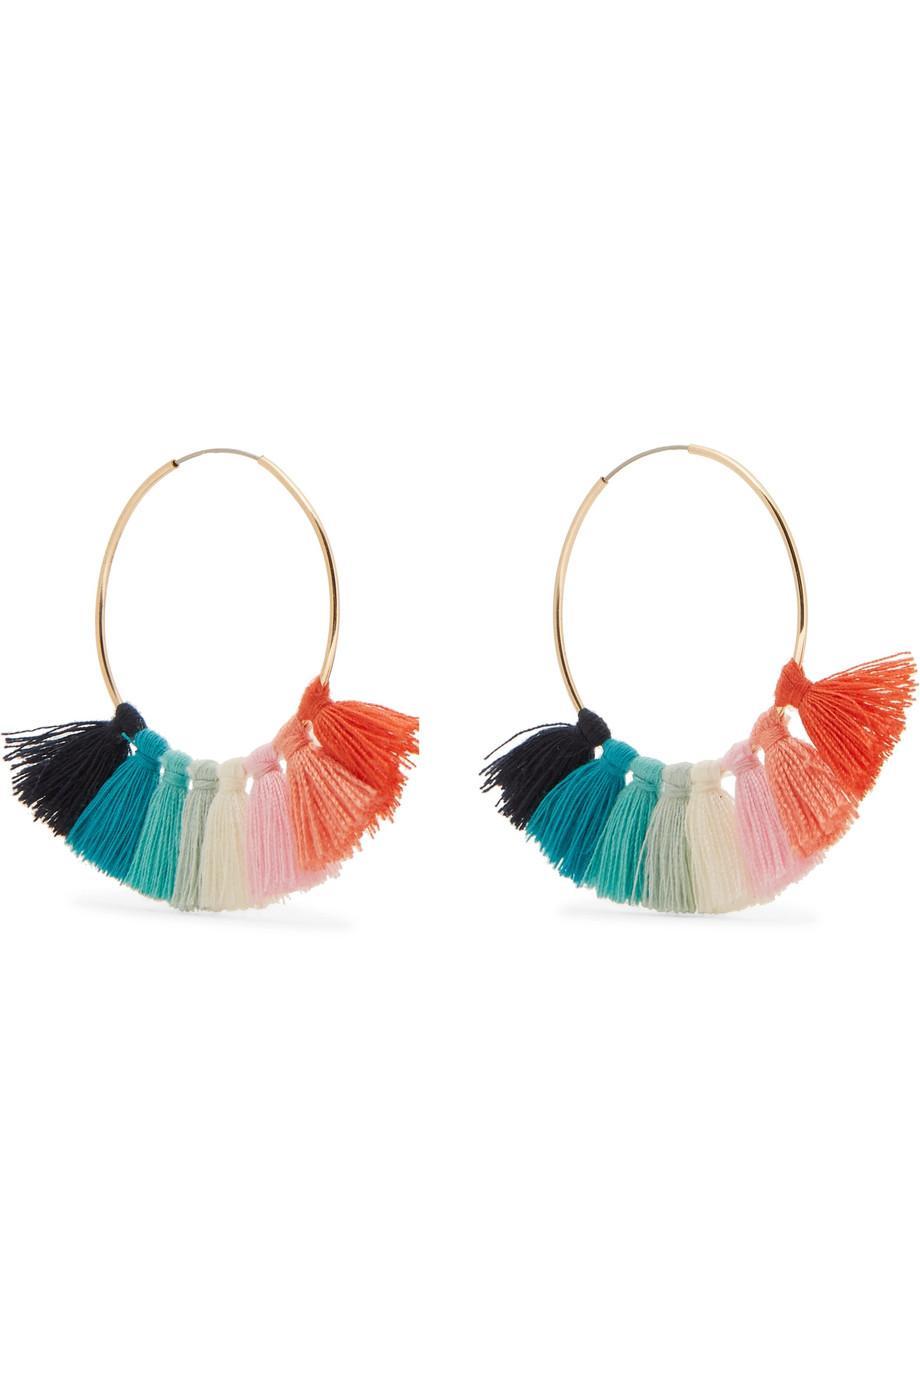 Kenneth Jay Lane Gold-tone Tasseled Hoop Earrings